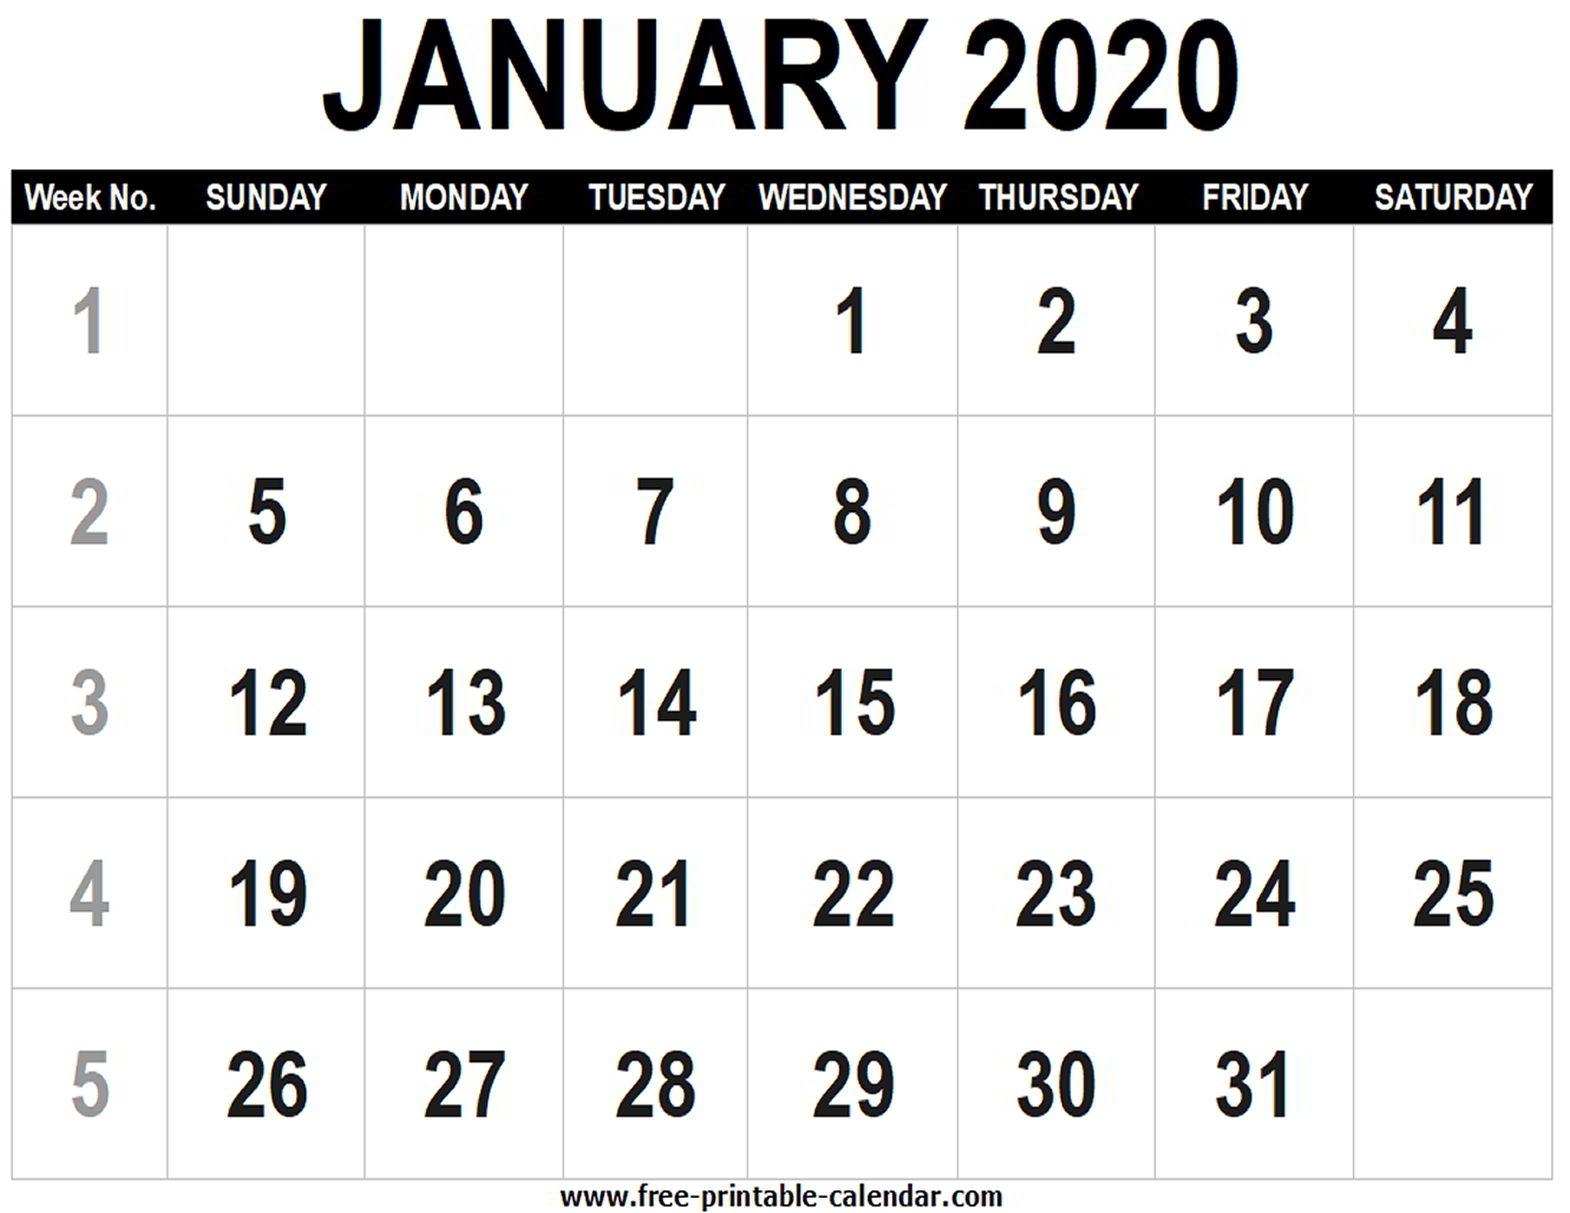 Blank Calendar 2020 January - Free-Printable-Calendar